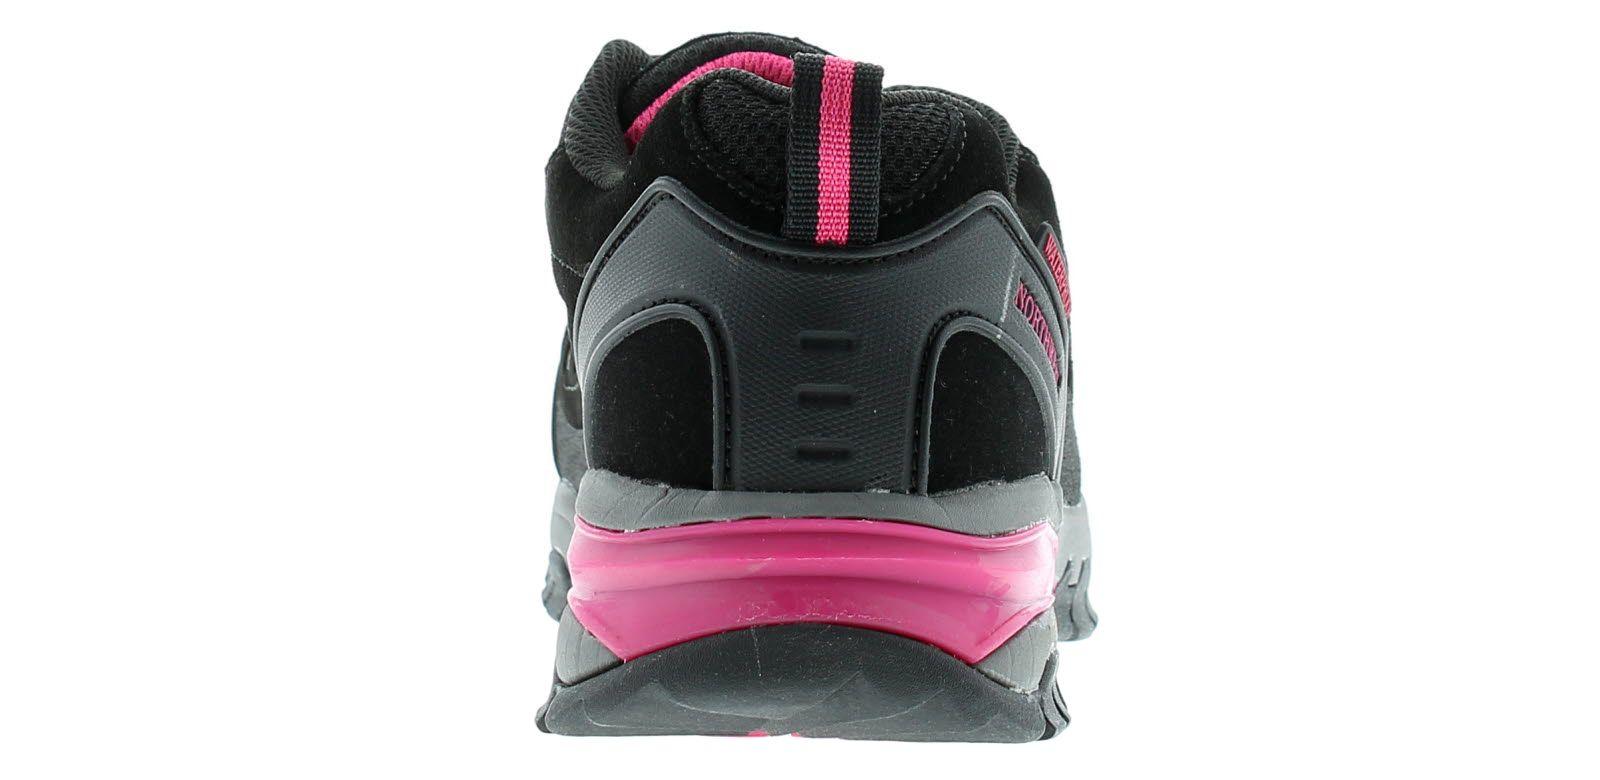 Northwest Territory keele lo leather Womens Waterproof Walking Boots black